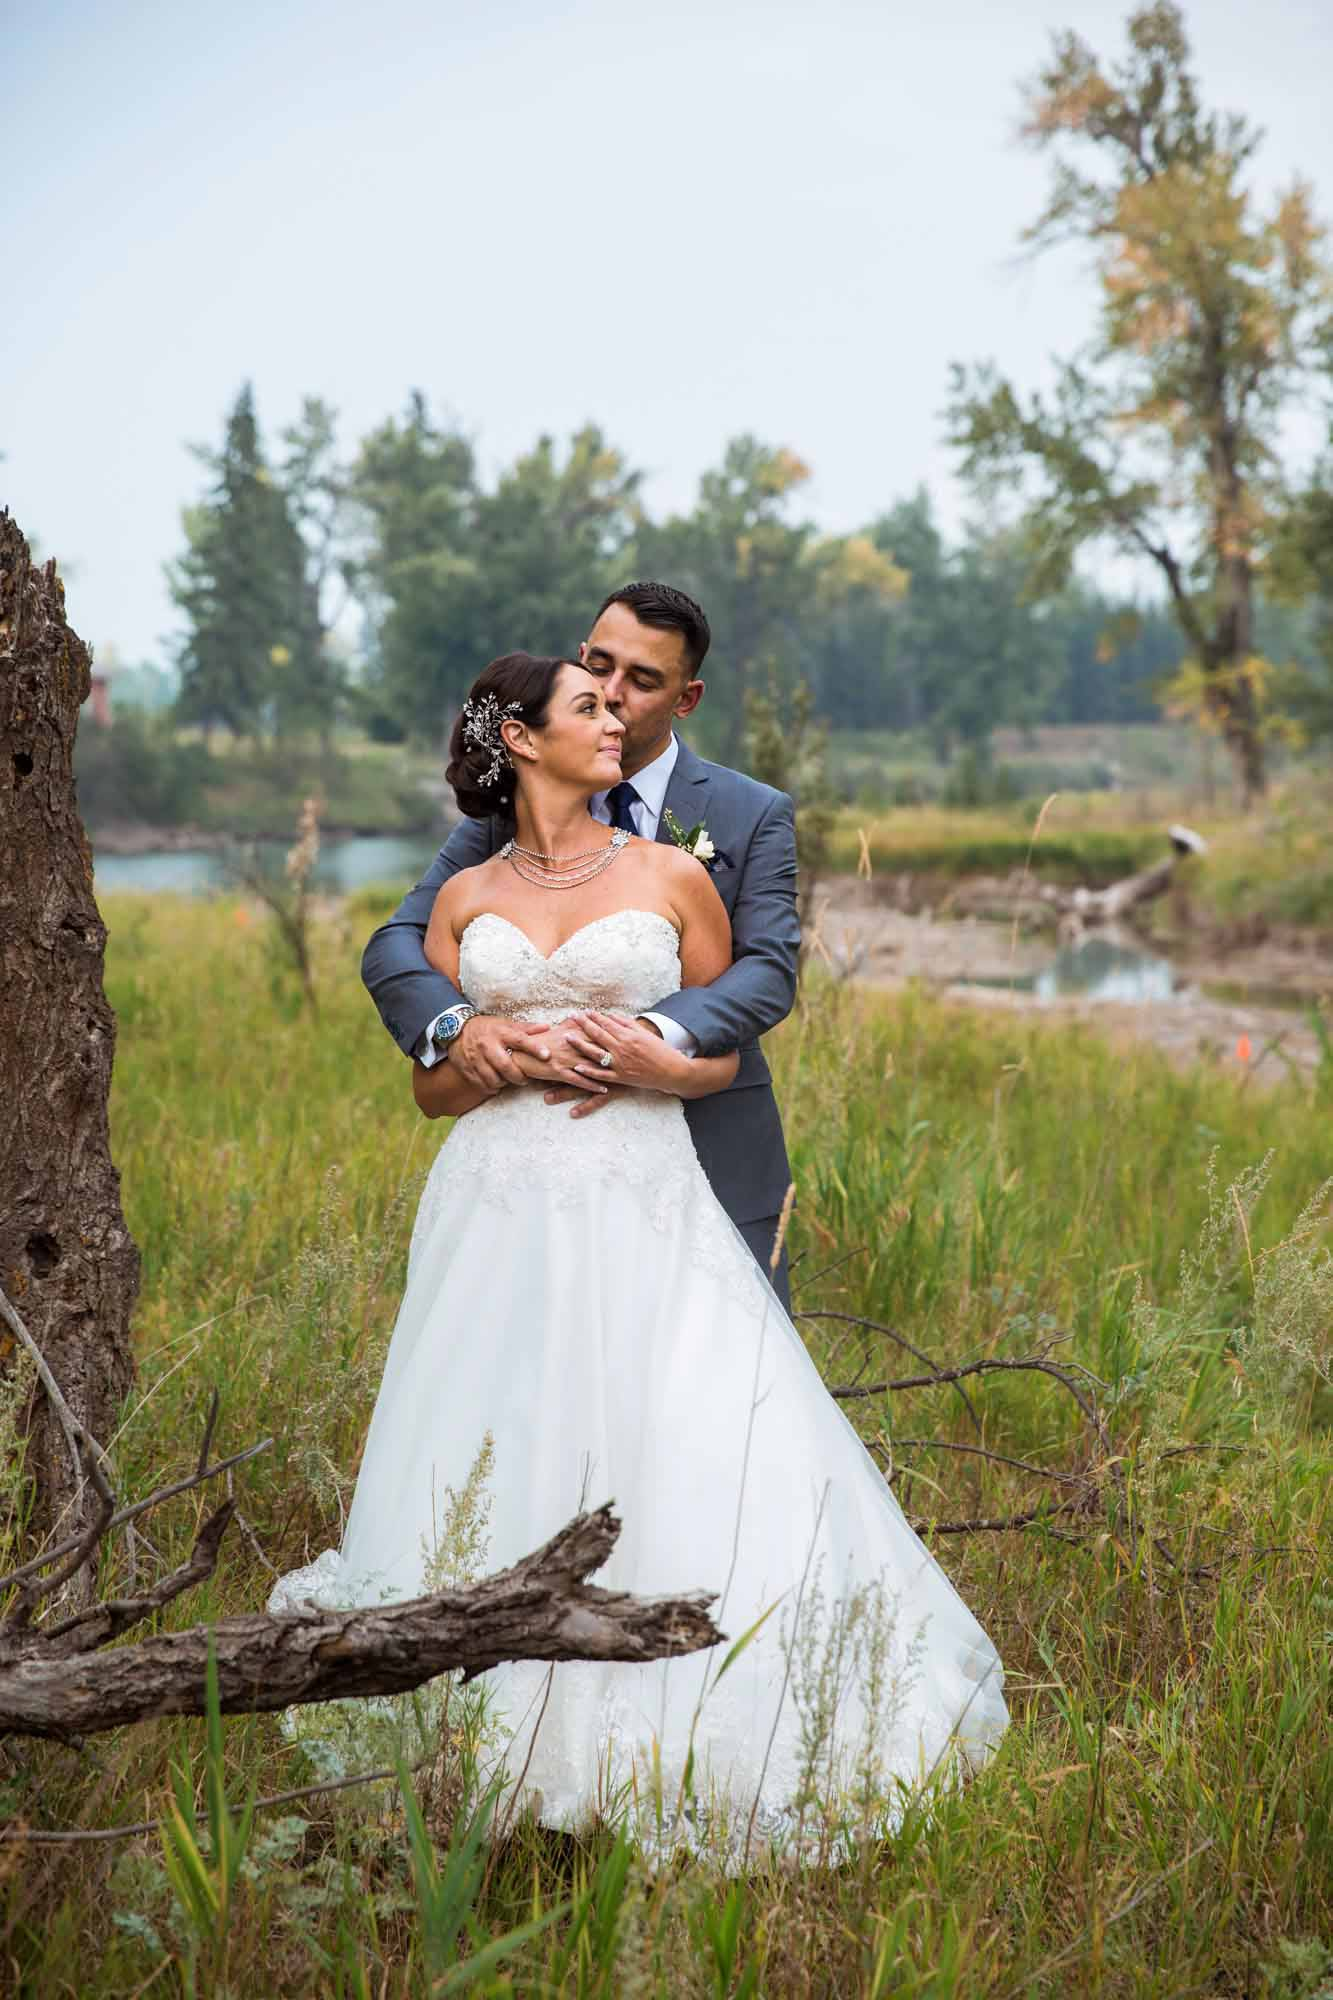 Calgary engagement and wedding photographer, micro wedding at Inglewood Bird Sanctuary